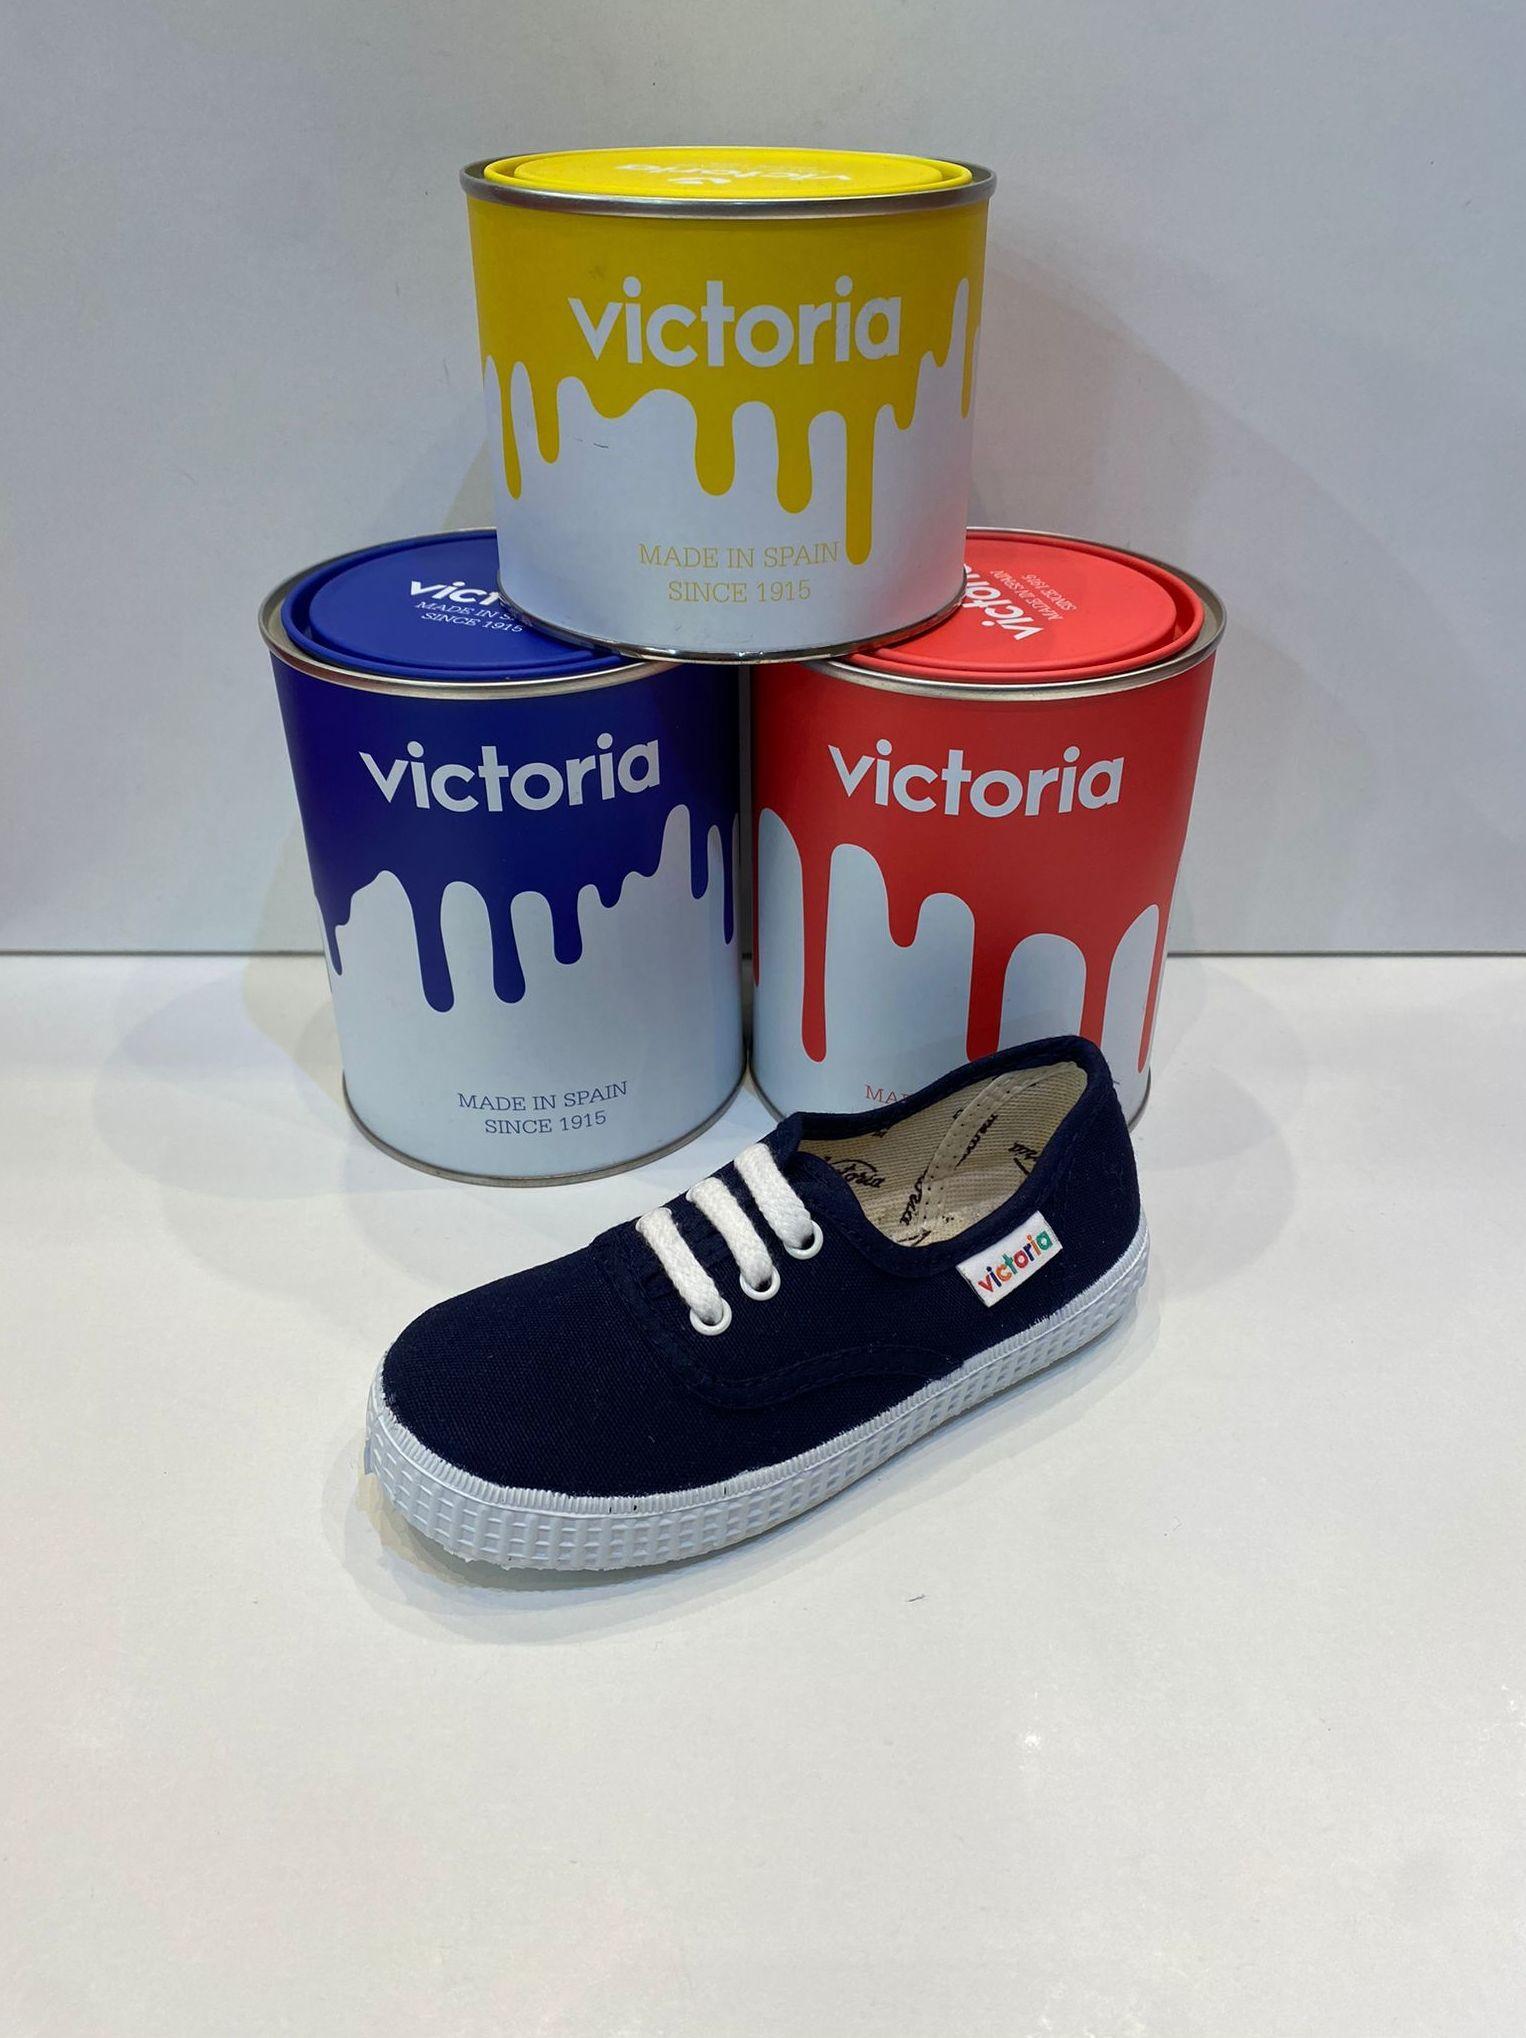 Loneta de la marca Victoria, amb cordons 24€ www.calzadosllinas.es